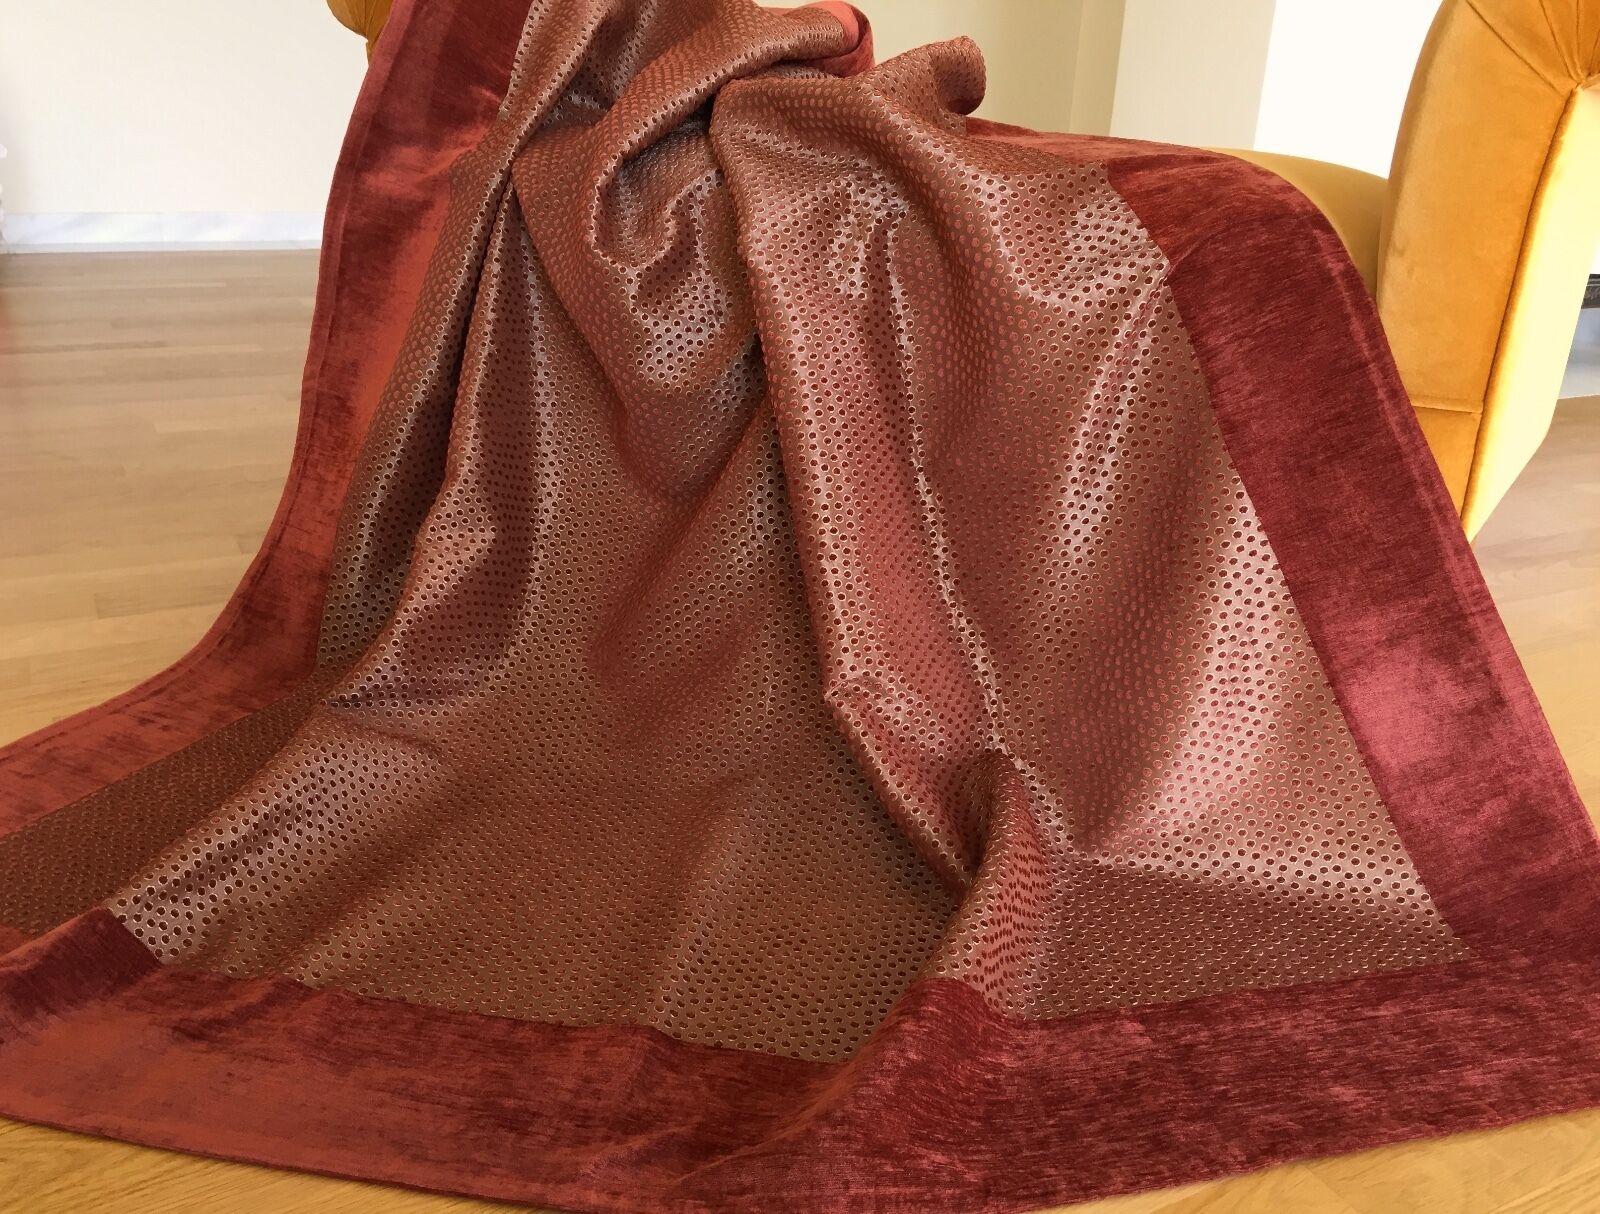 Luxurious Chenille Taffeta Throw Cover Armchair Two Seater Sofa170x180 Rust gold